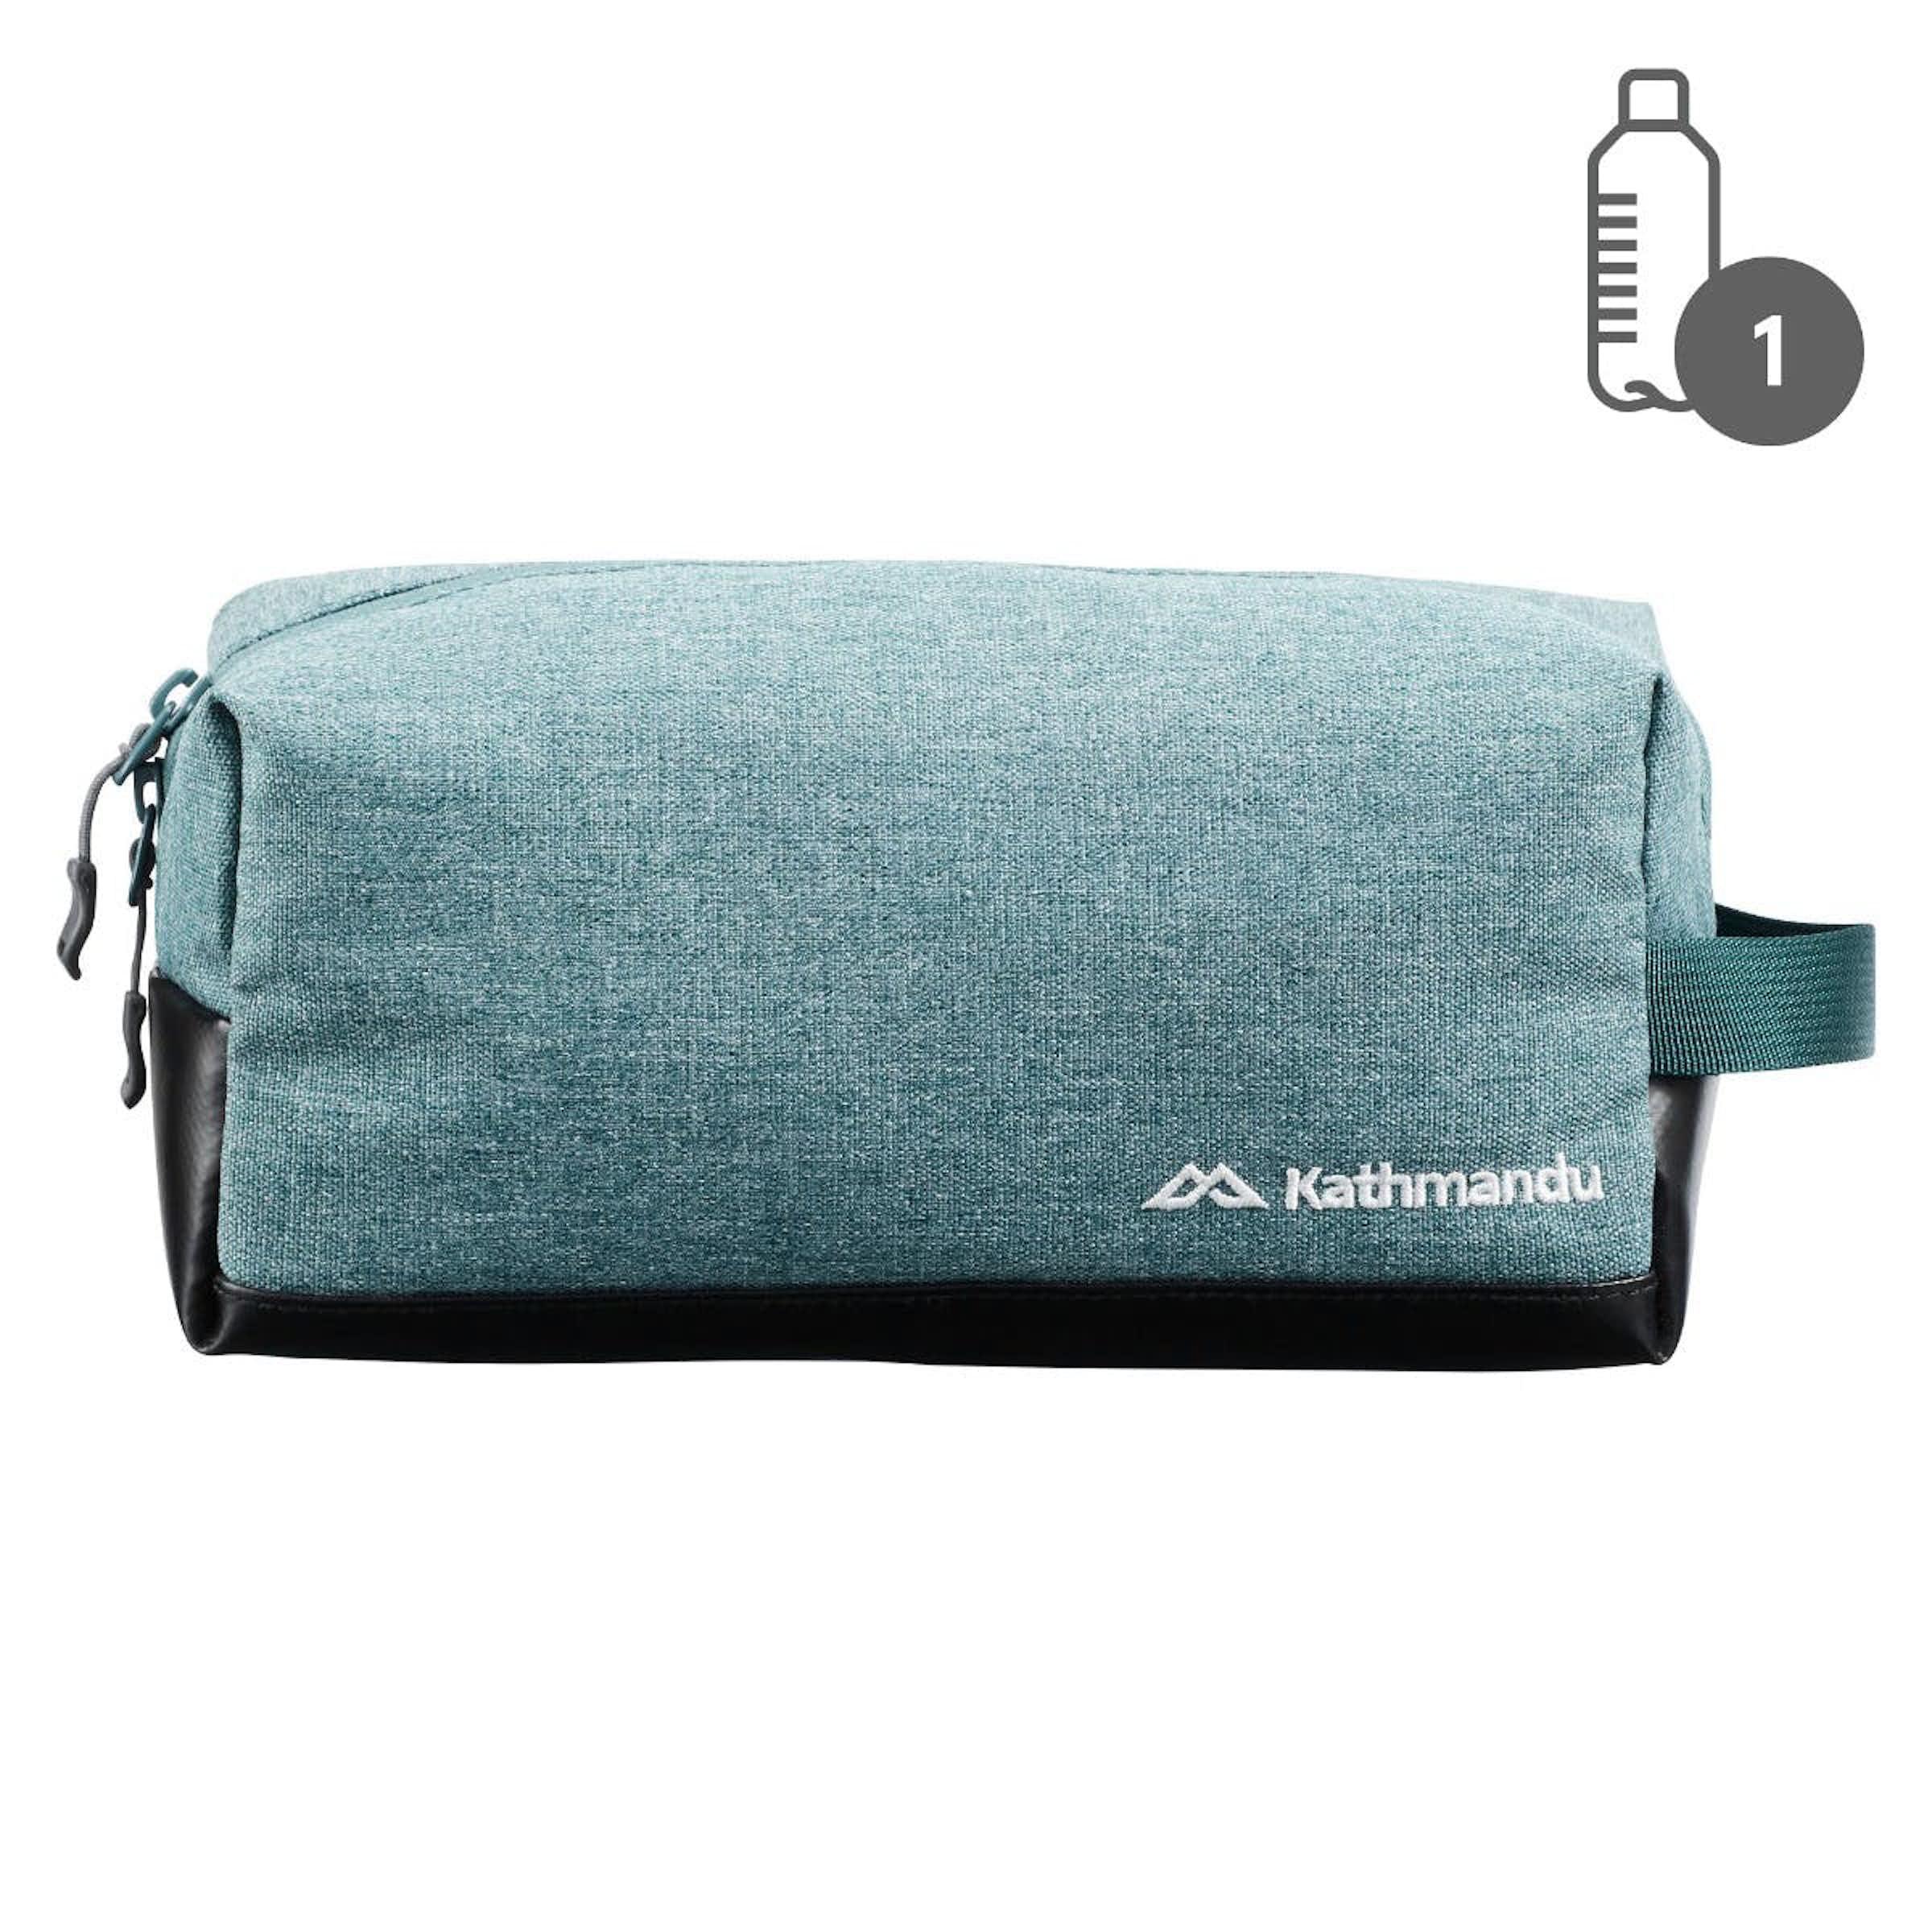 cfda61ffc07 Toiletry Bags | Mens & Womens Travel Makeup & Cosmetic Bags | NZ